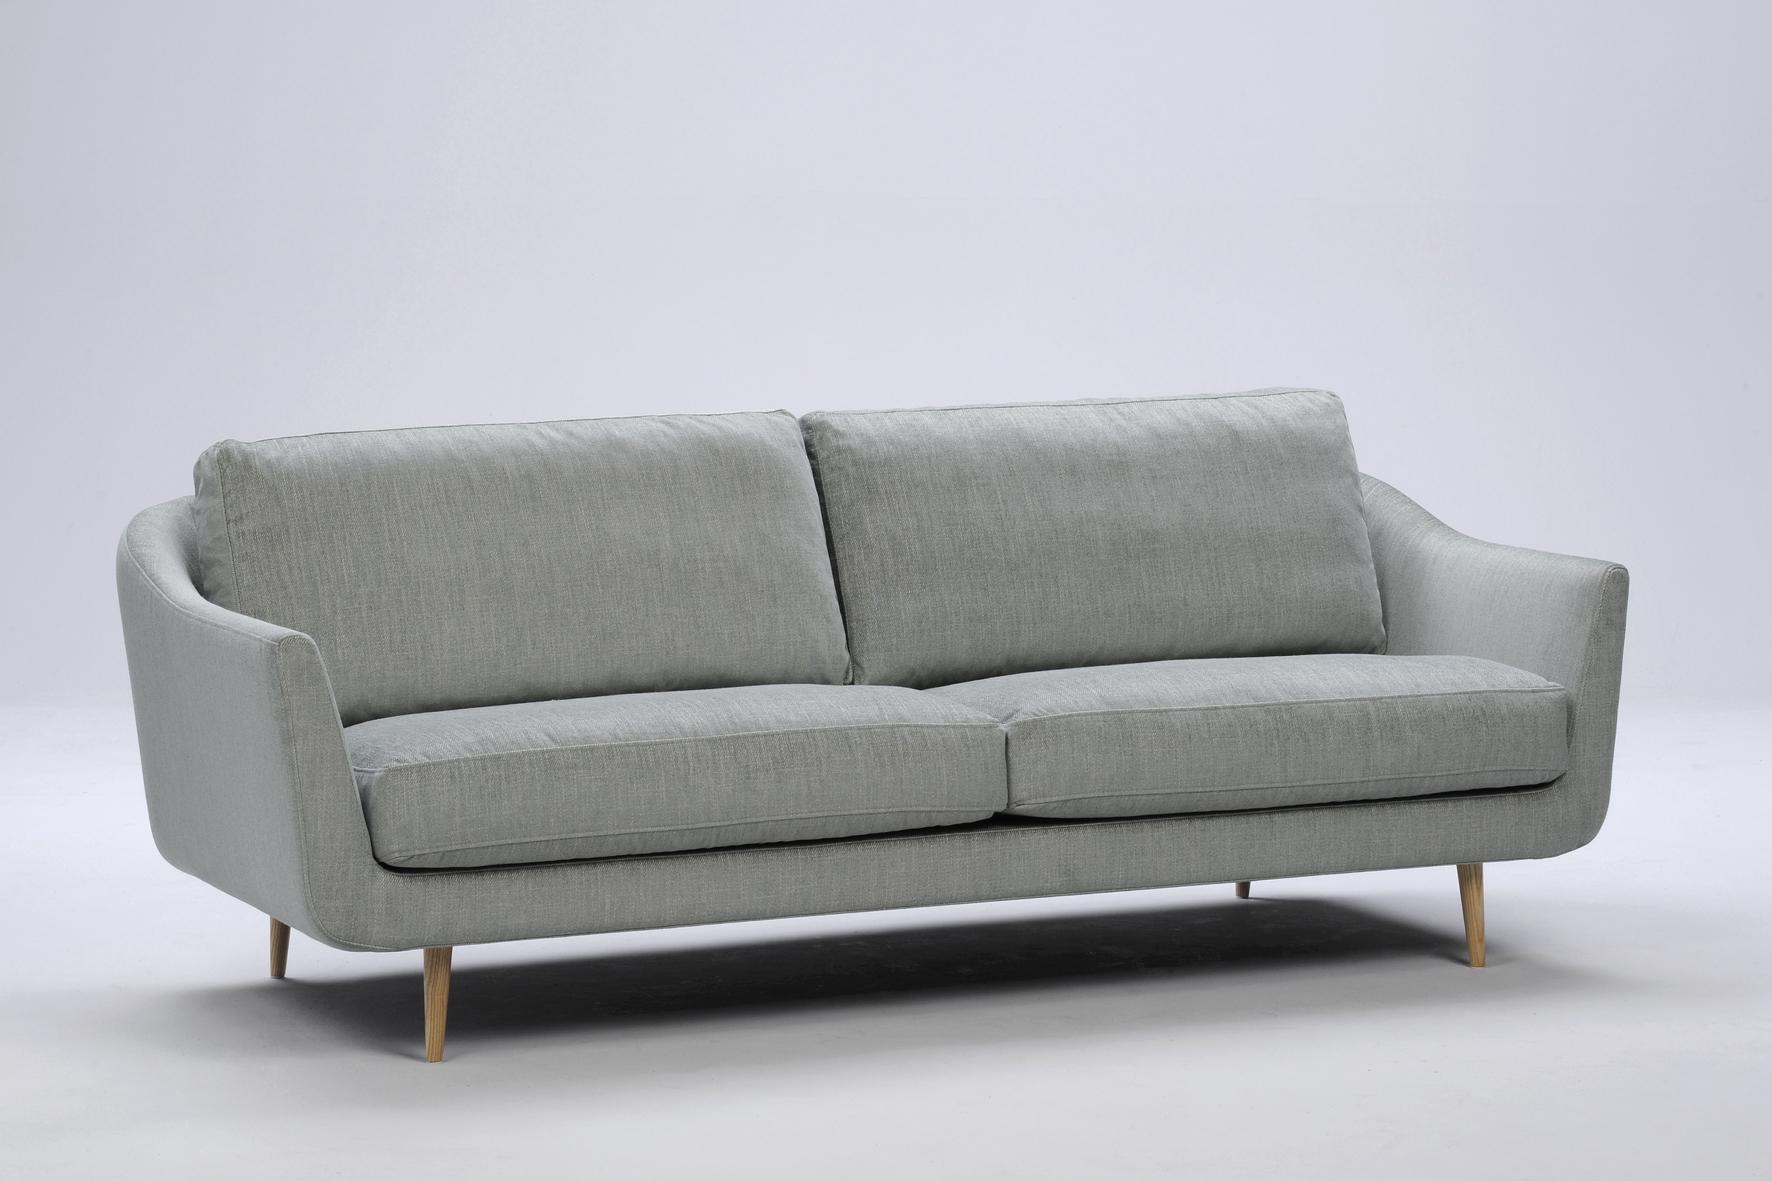 Interfacen Duna-sohva